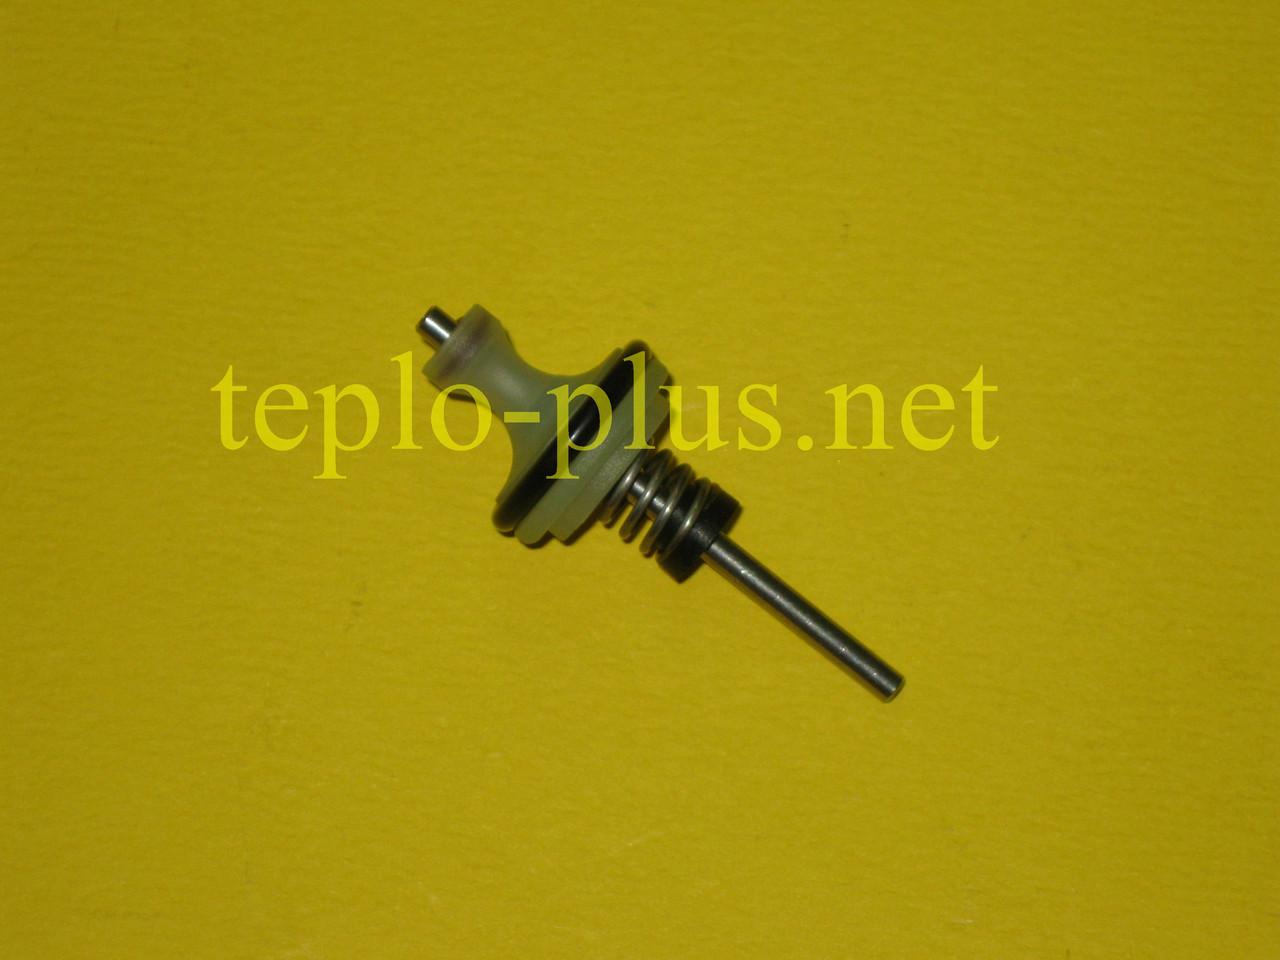 Шток трехходового клапана 0020118778 (3003202760) Protherm Lynx HK, Ягуар (Jaguar), Гепард (Gepard)